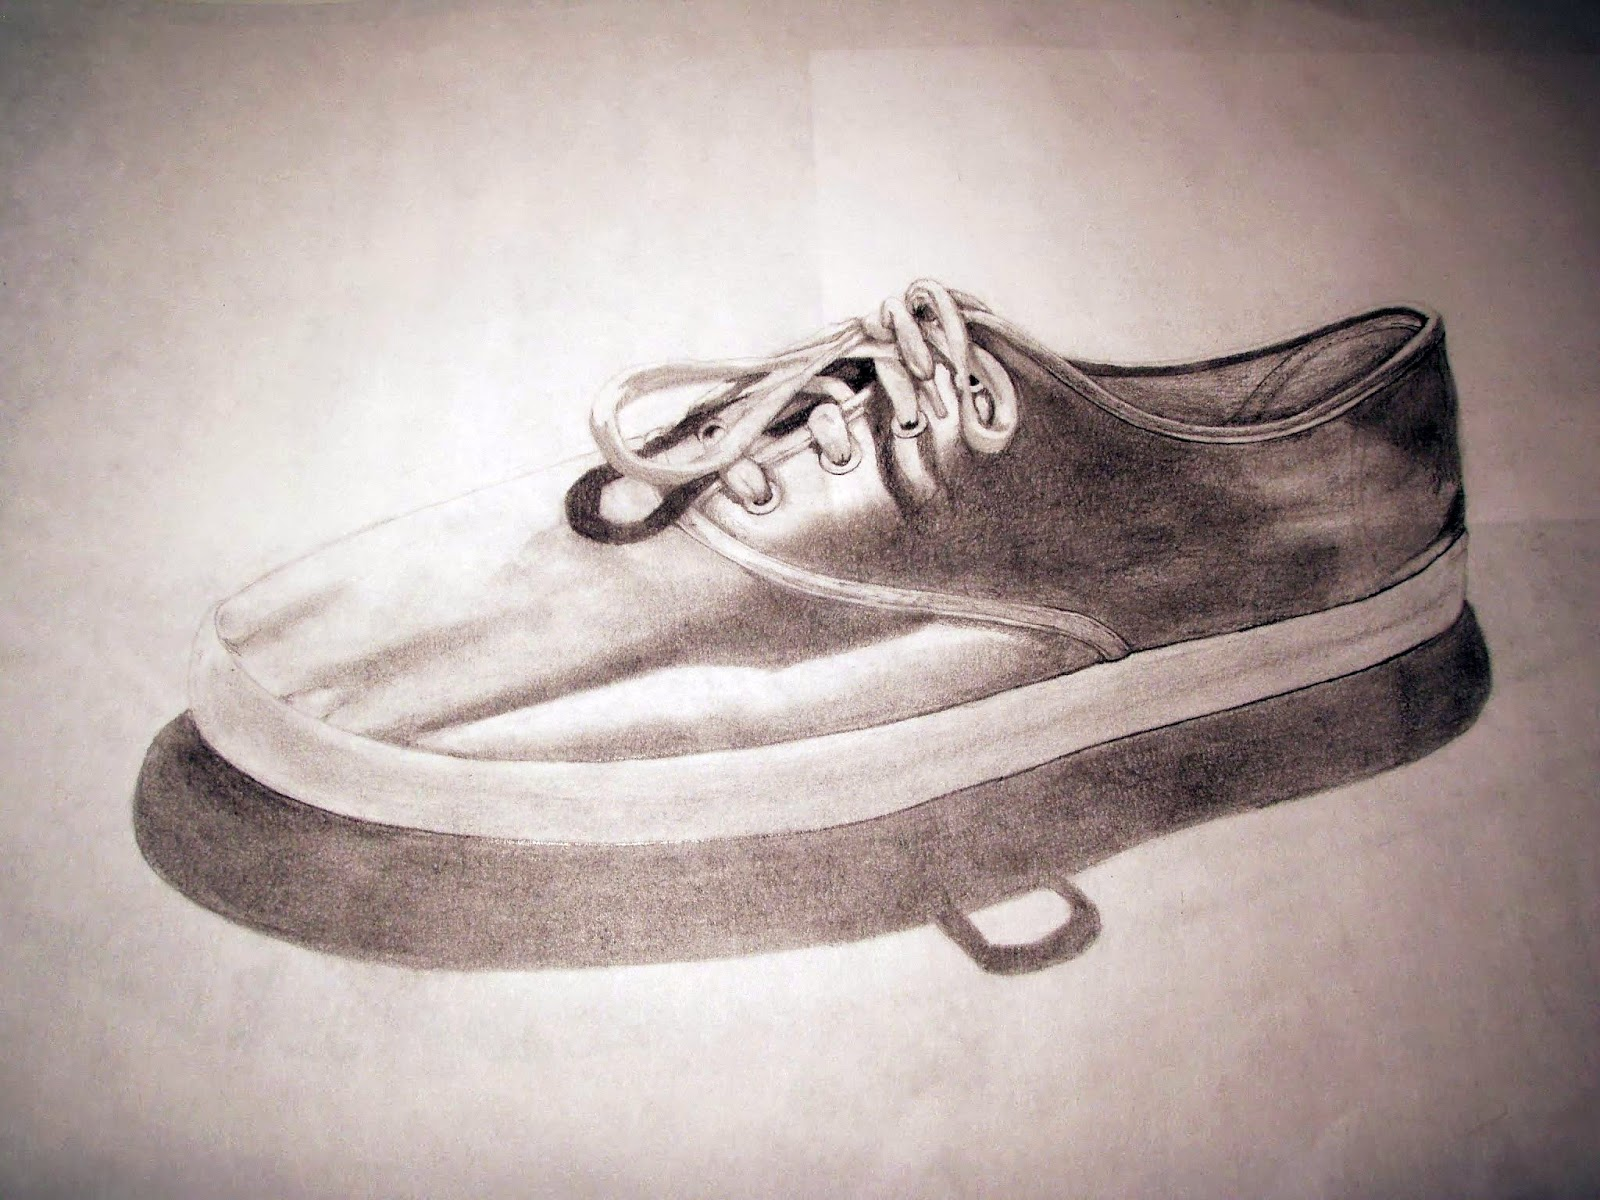 Contour Line Drawing Shoes Lesson Plan : Lesson plan: shoe drawing stacey cabon. visual arts.